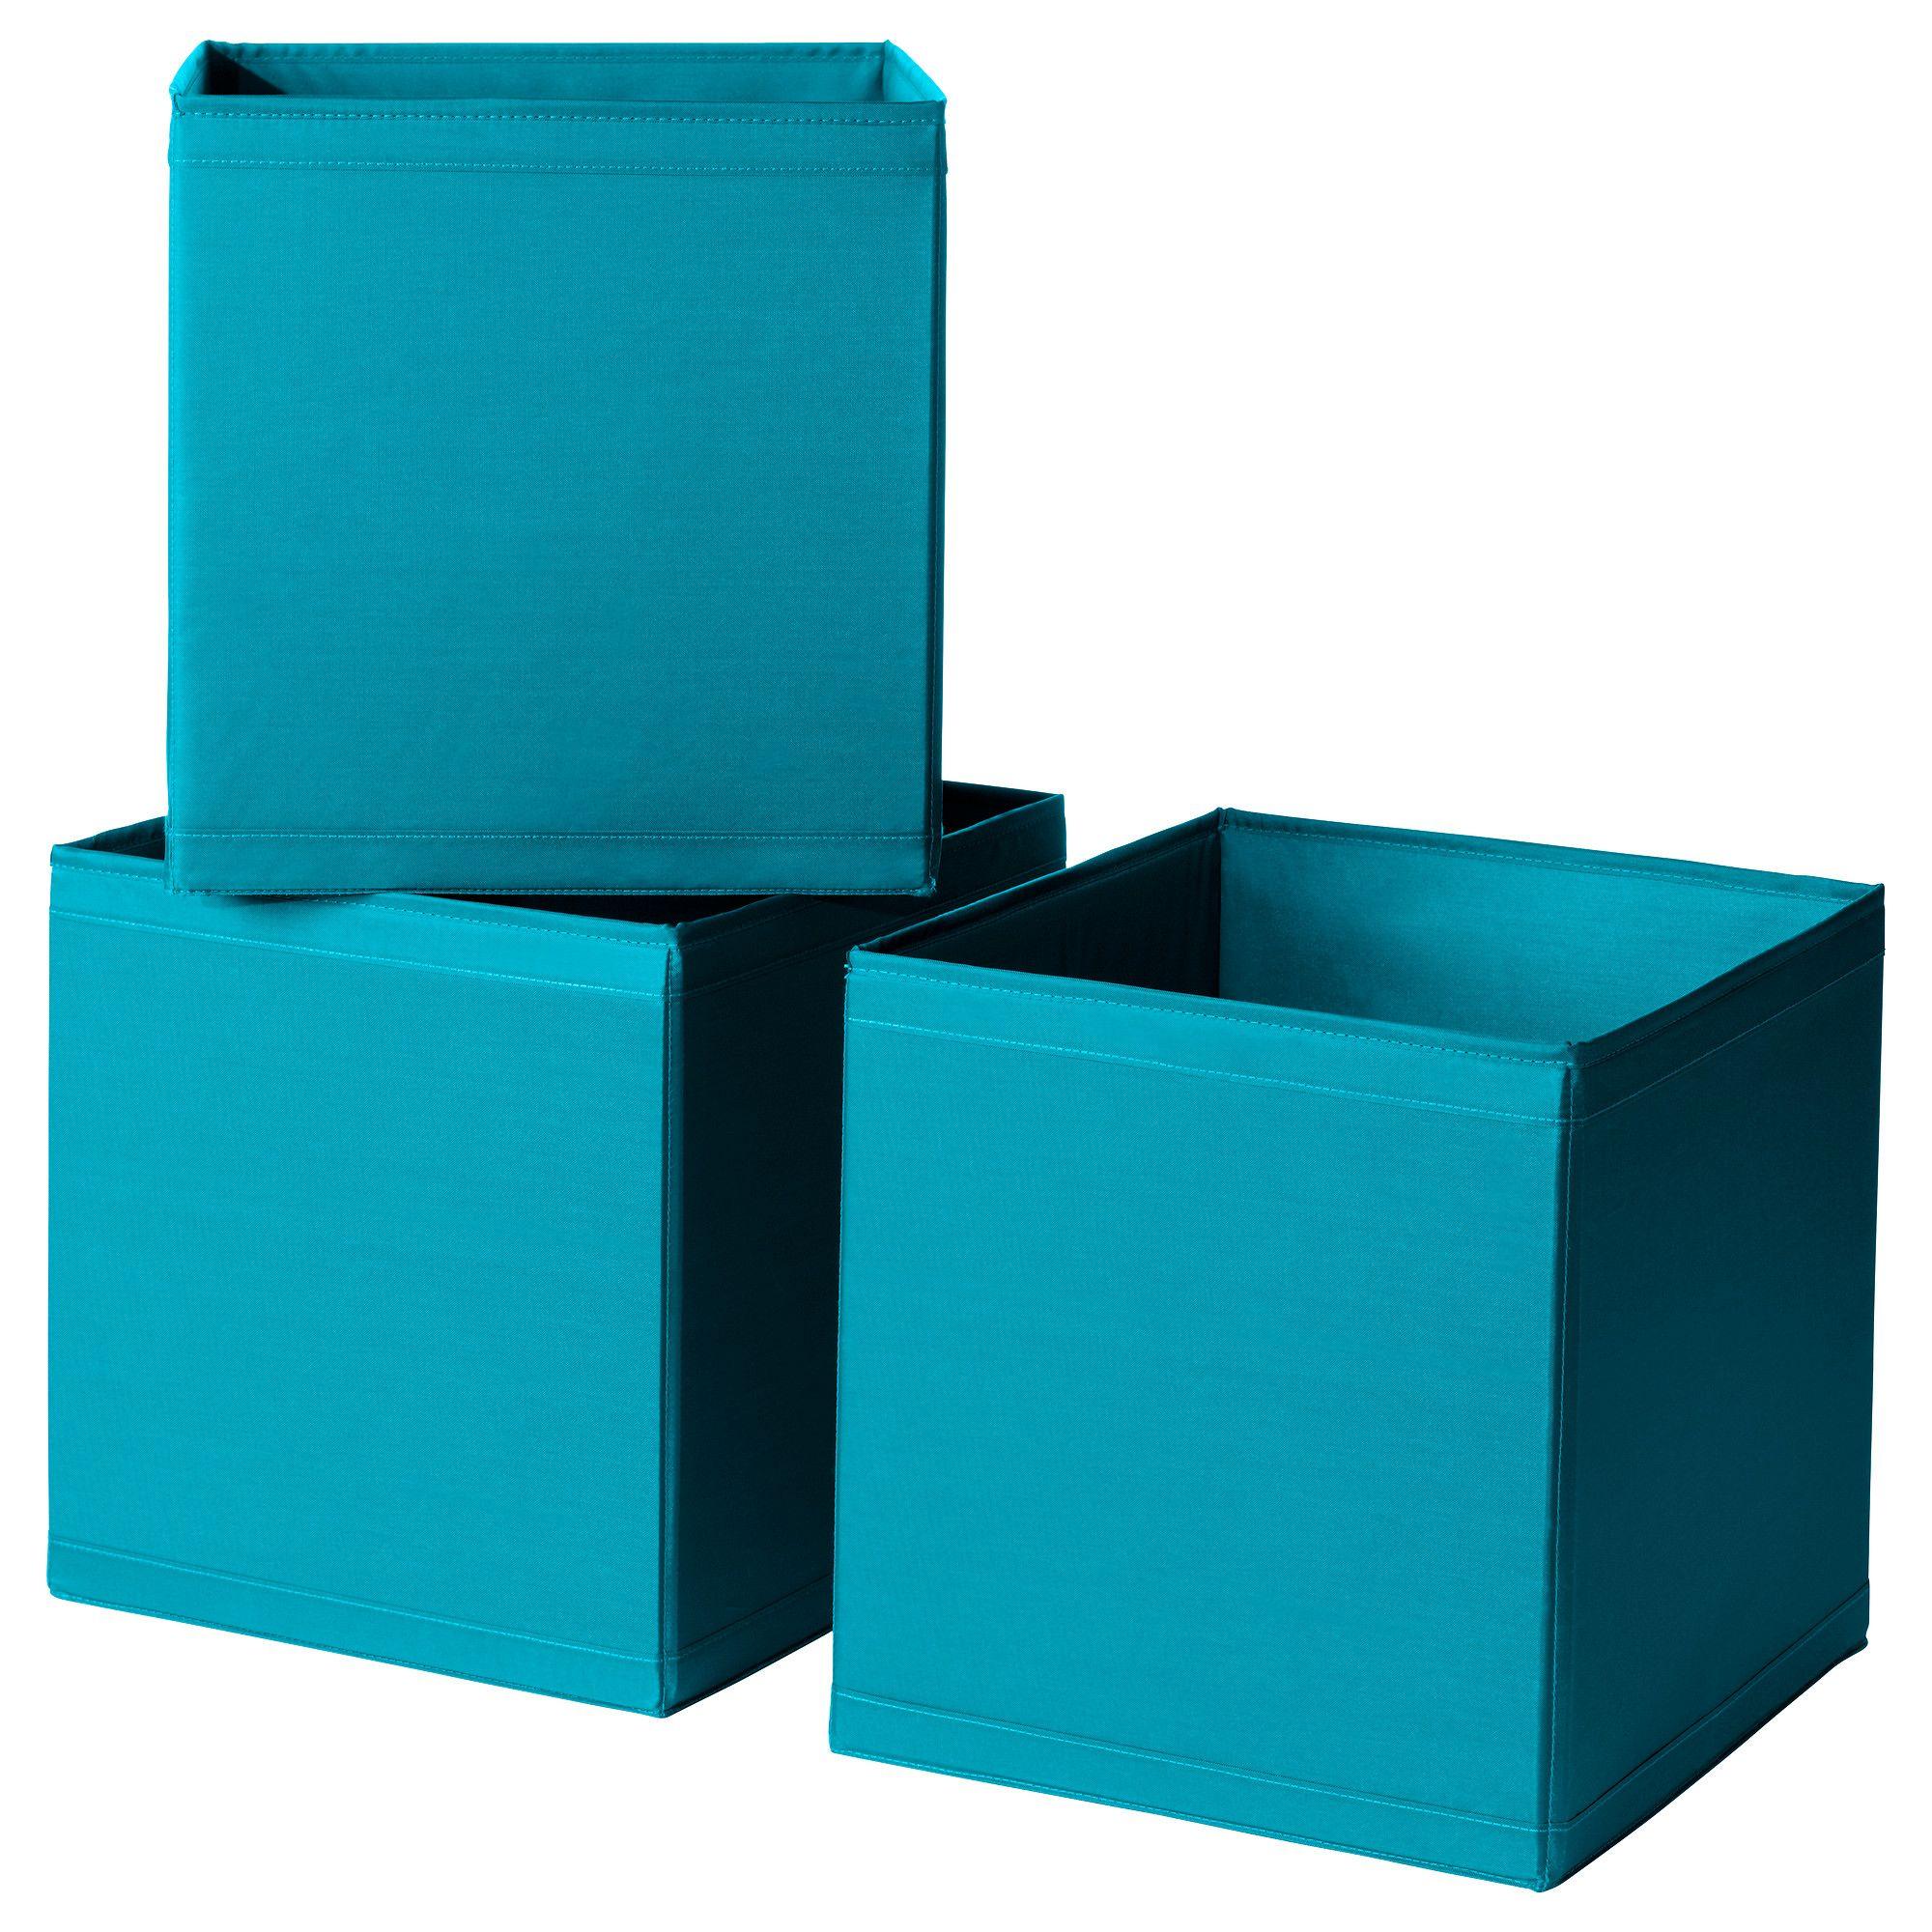 ikea skubb box white girls nursery ikea boxes ikea. Black Bedroom Furniture Sets. Home Design Ideas